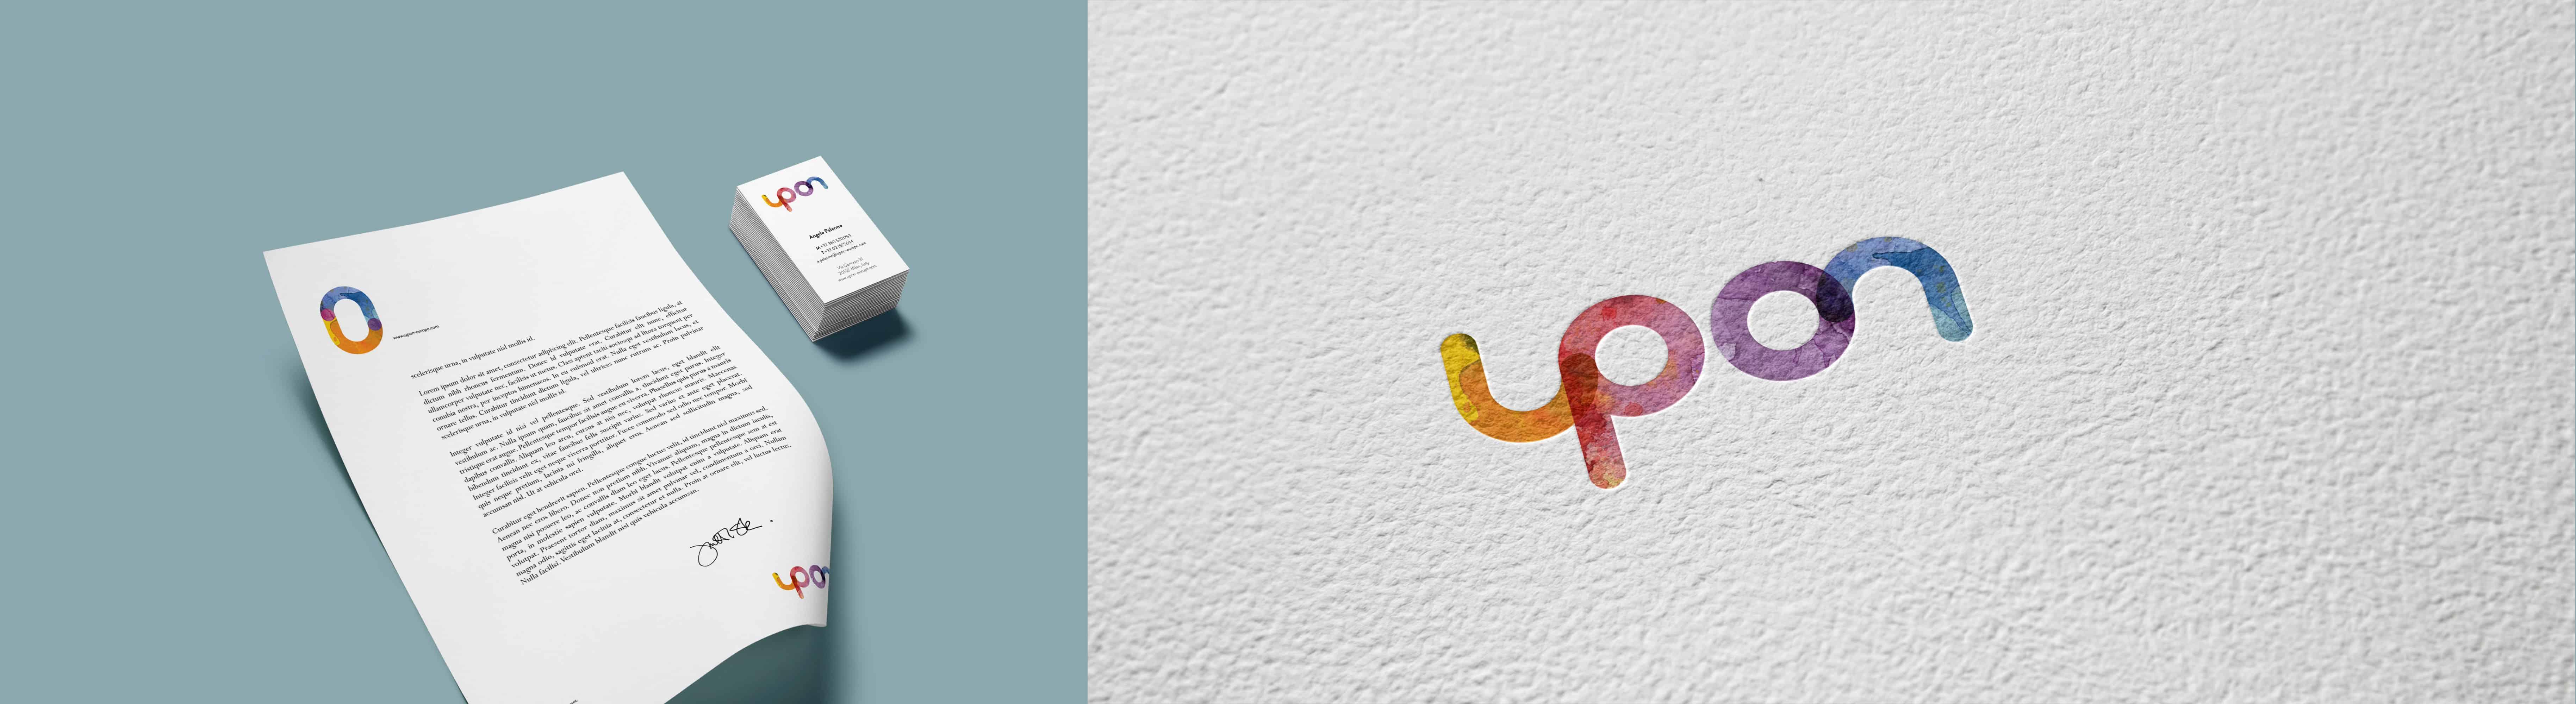 ondesign-upon-brand-design-corporate-identity-slider3